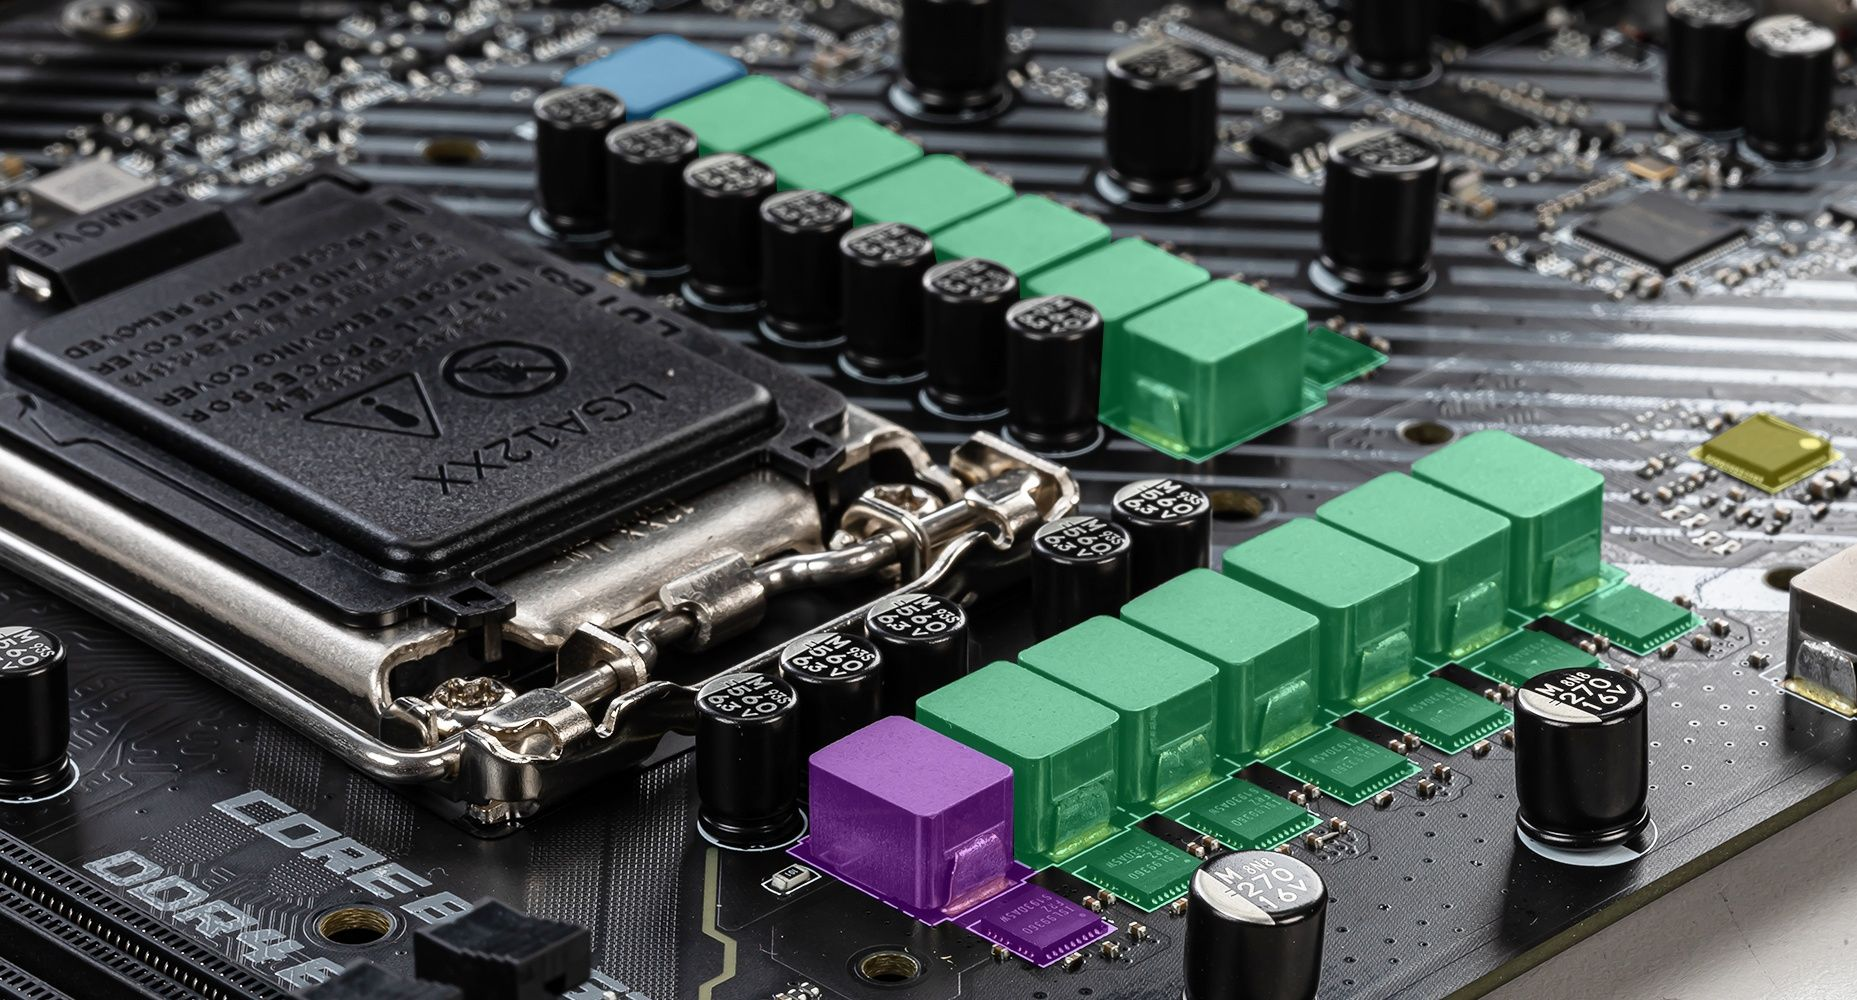 MSI MPG Z490 CARBON EK X 12+1+1 DUET RAIL POWER SYSTEM